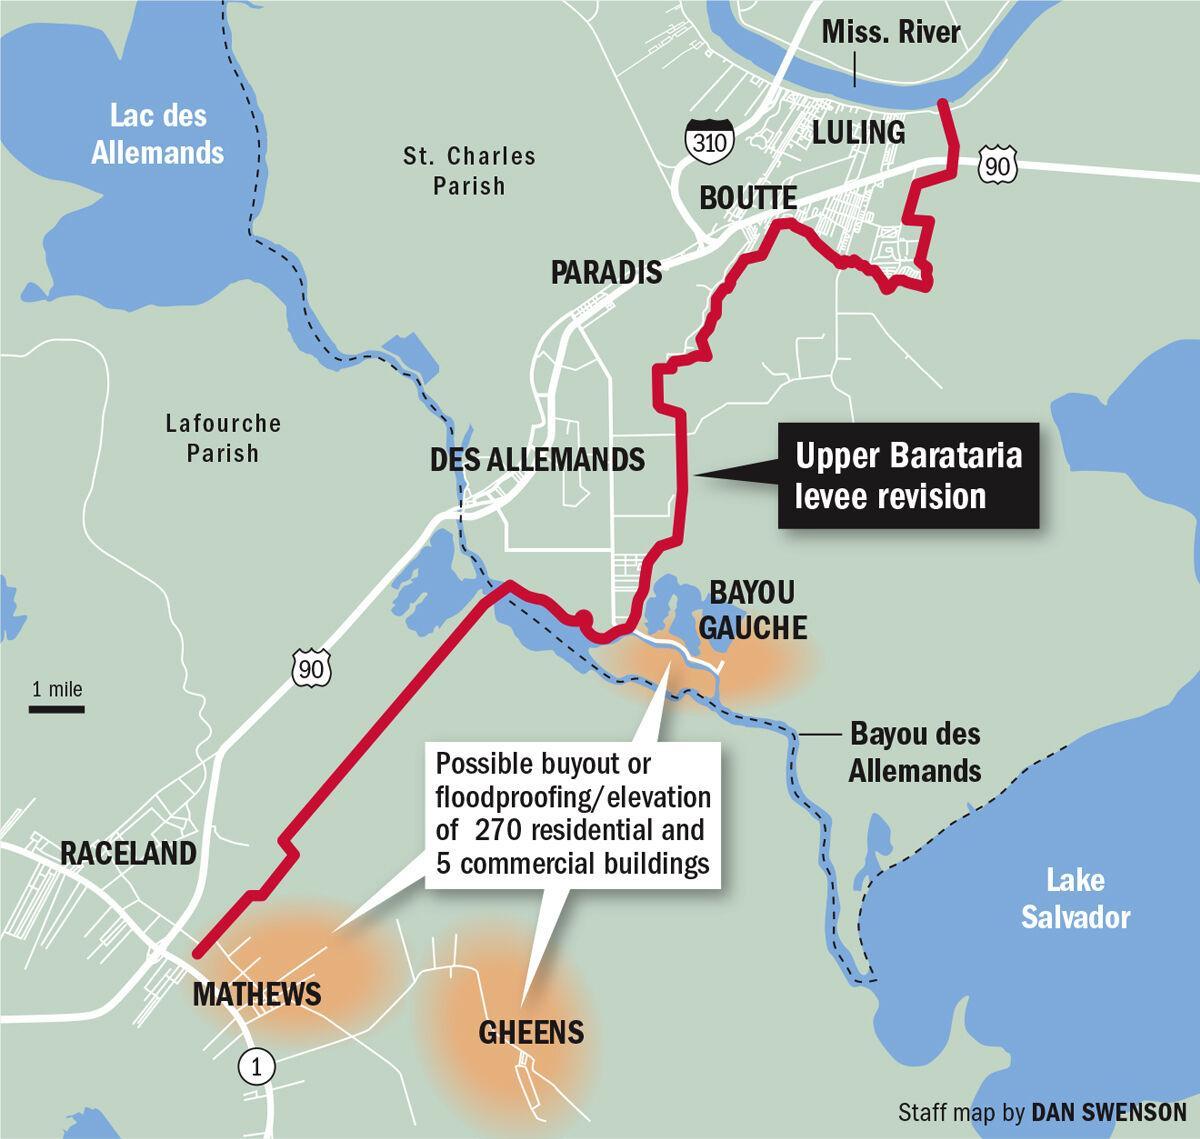 Upper Barataria Risk Reduction levee